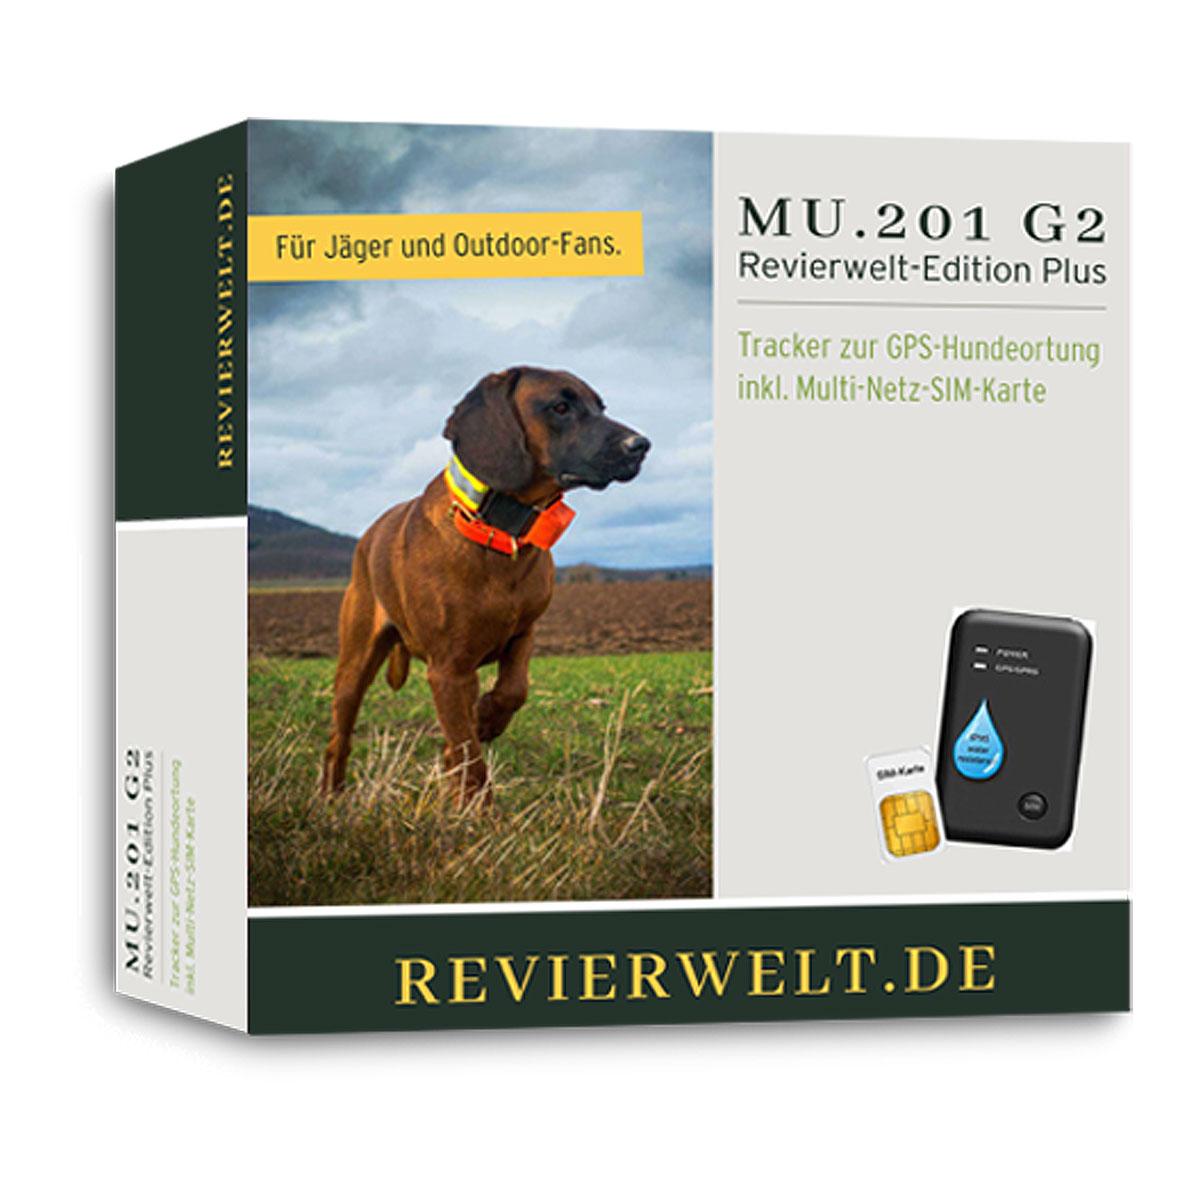 c1cc9f67cafeea GPS-Tracker MU.201G2 Revierwelt-Edition - kaufen auf Pareyshop.de